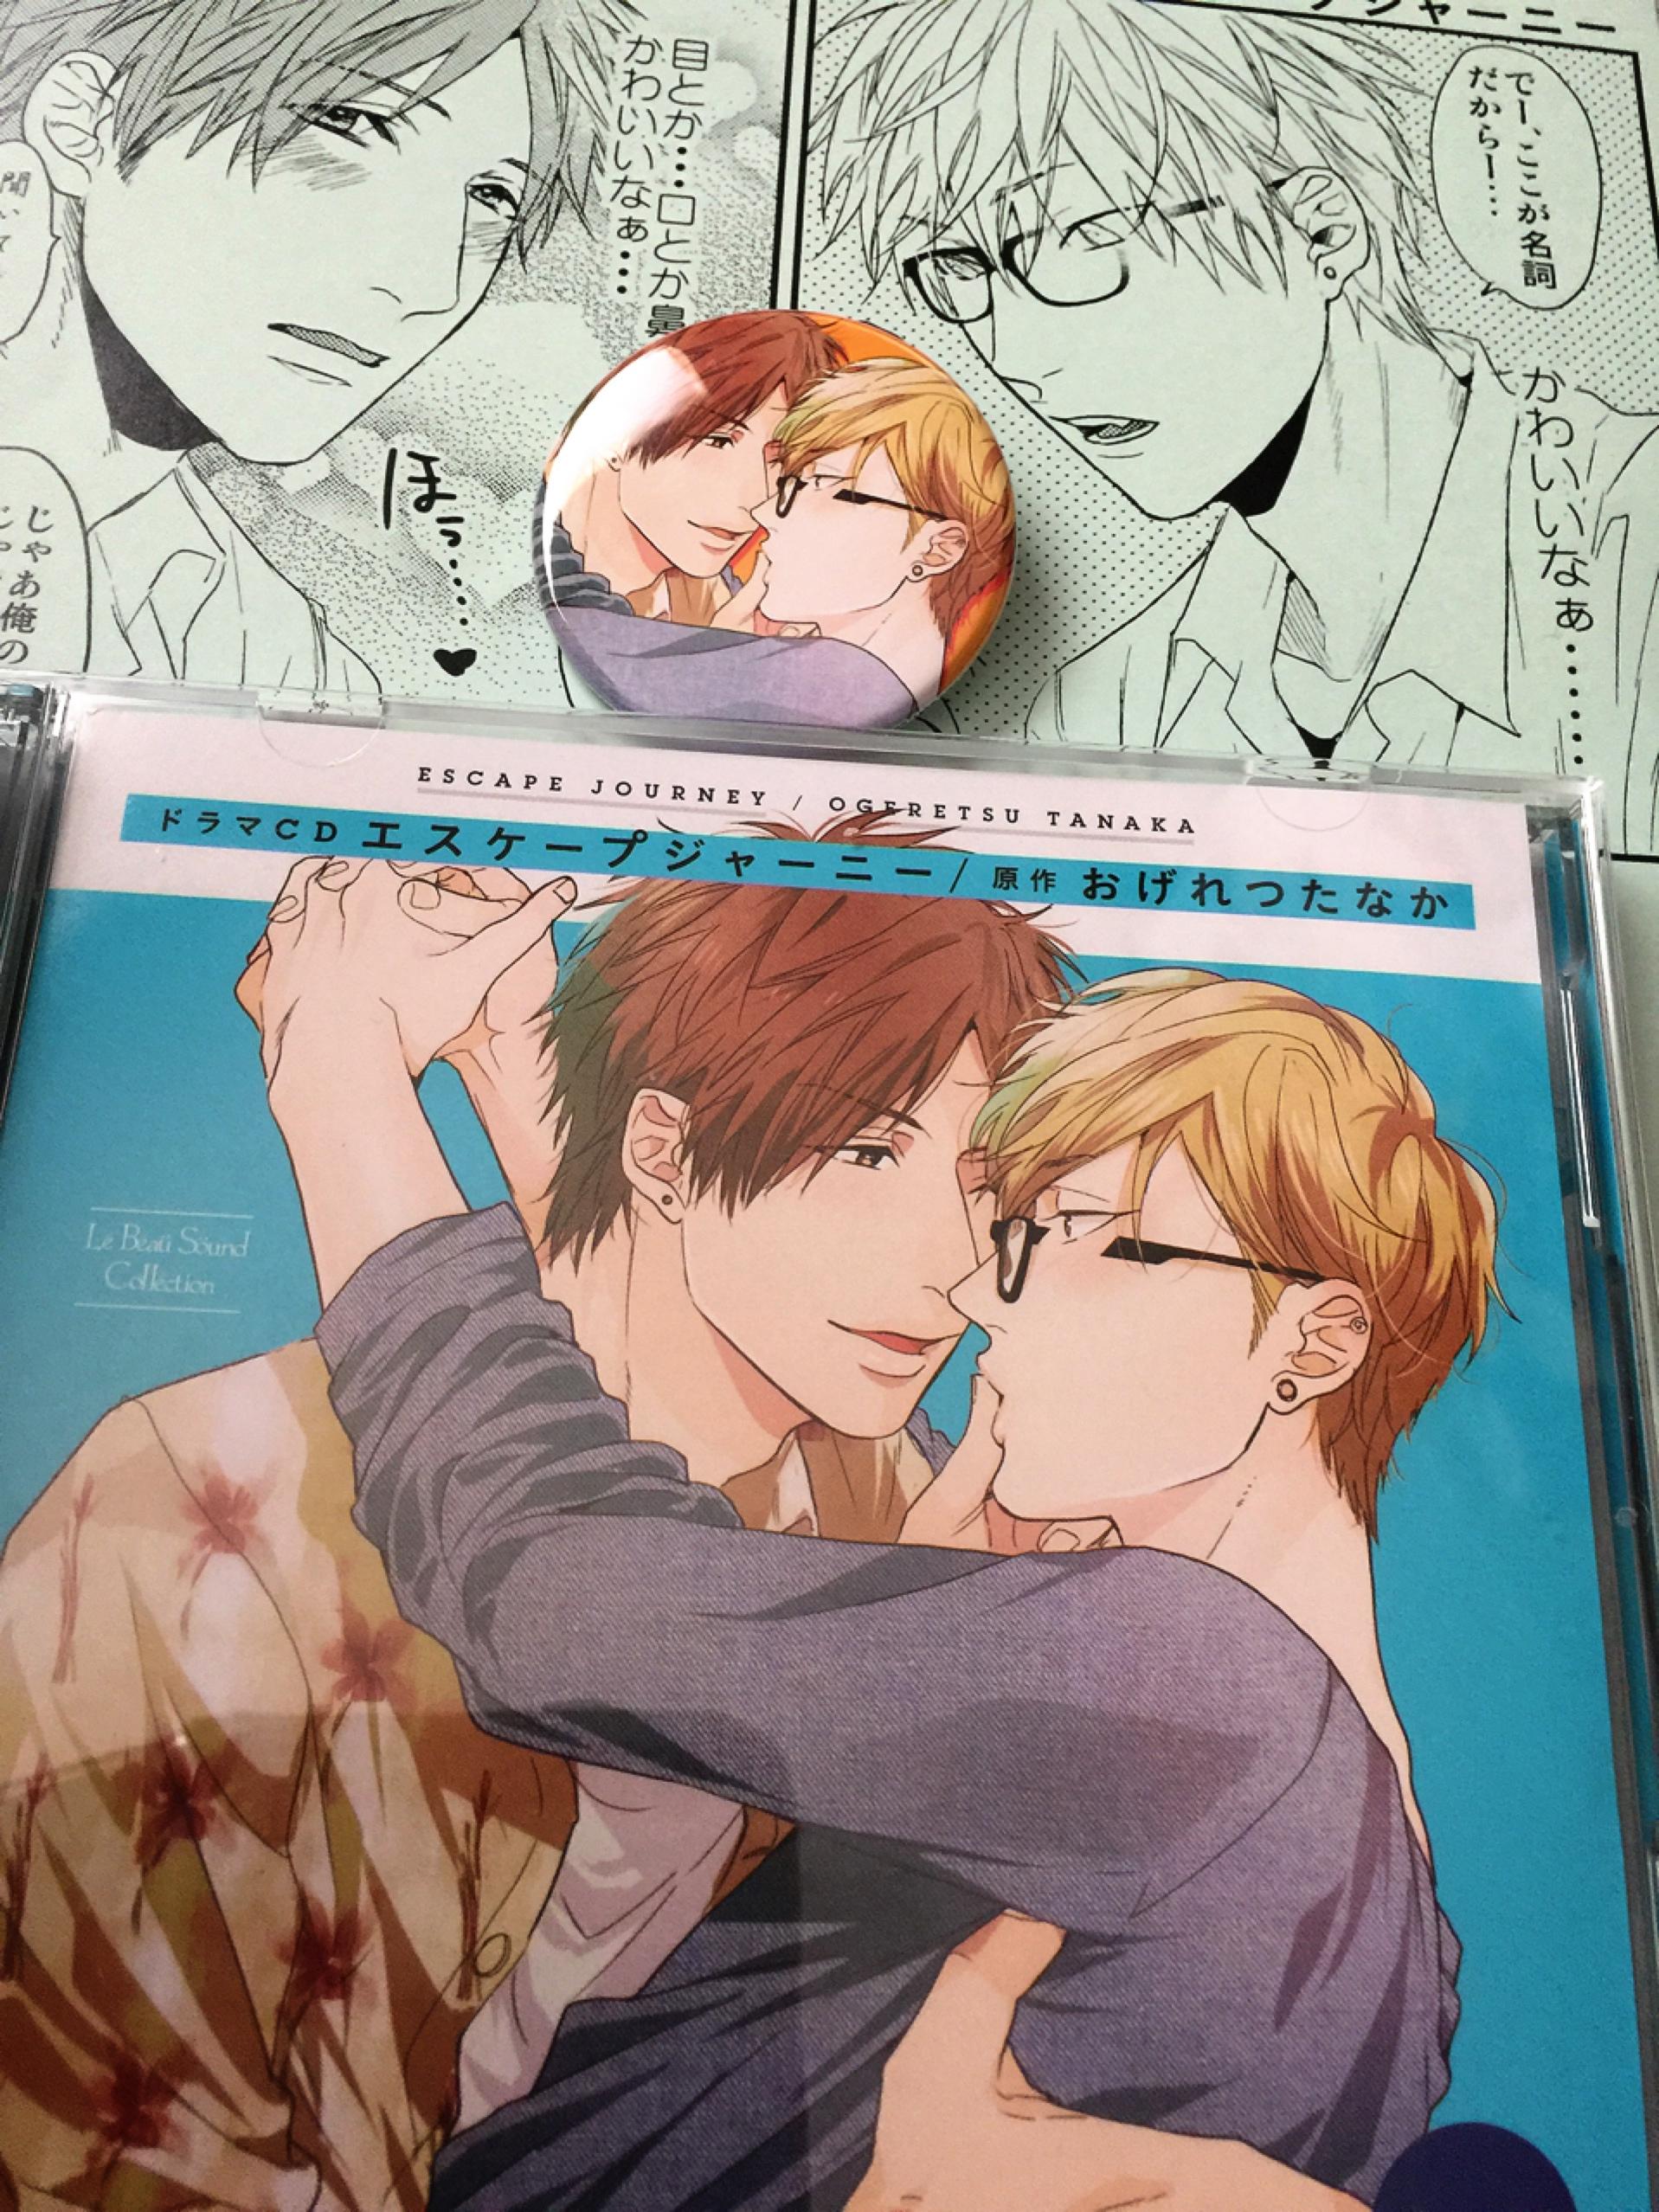 badge animate drama_cd marine_entertainment maeno_tomoaki nakazawa_masatomo le_beau_sound_collection ogeretsu_tanaka escape_journey hase_taichi hisami_naoto